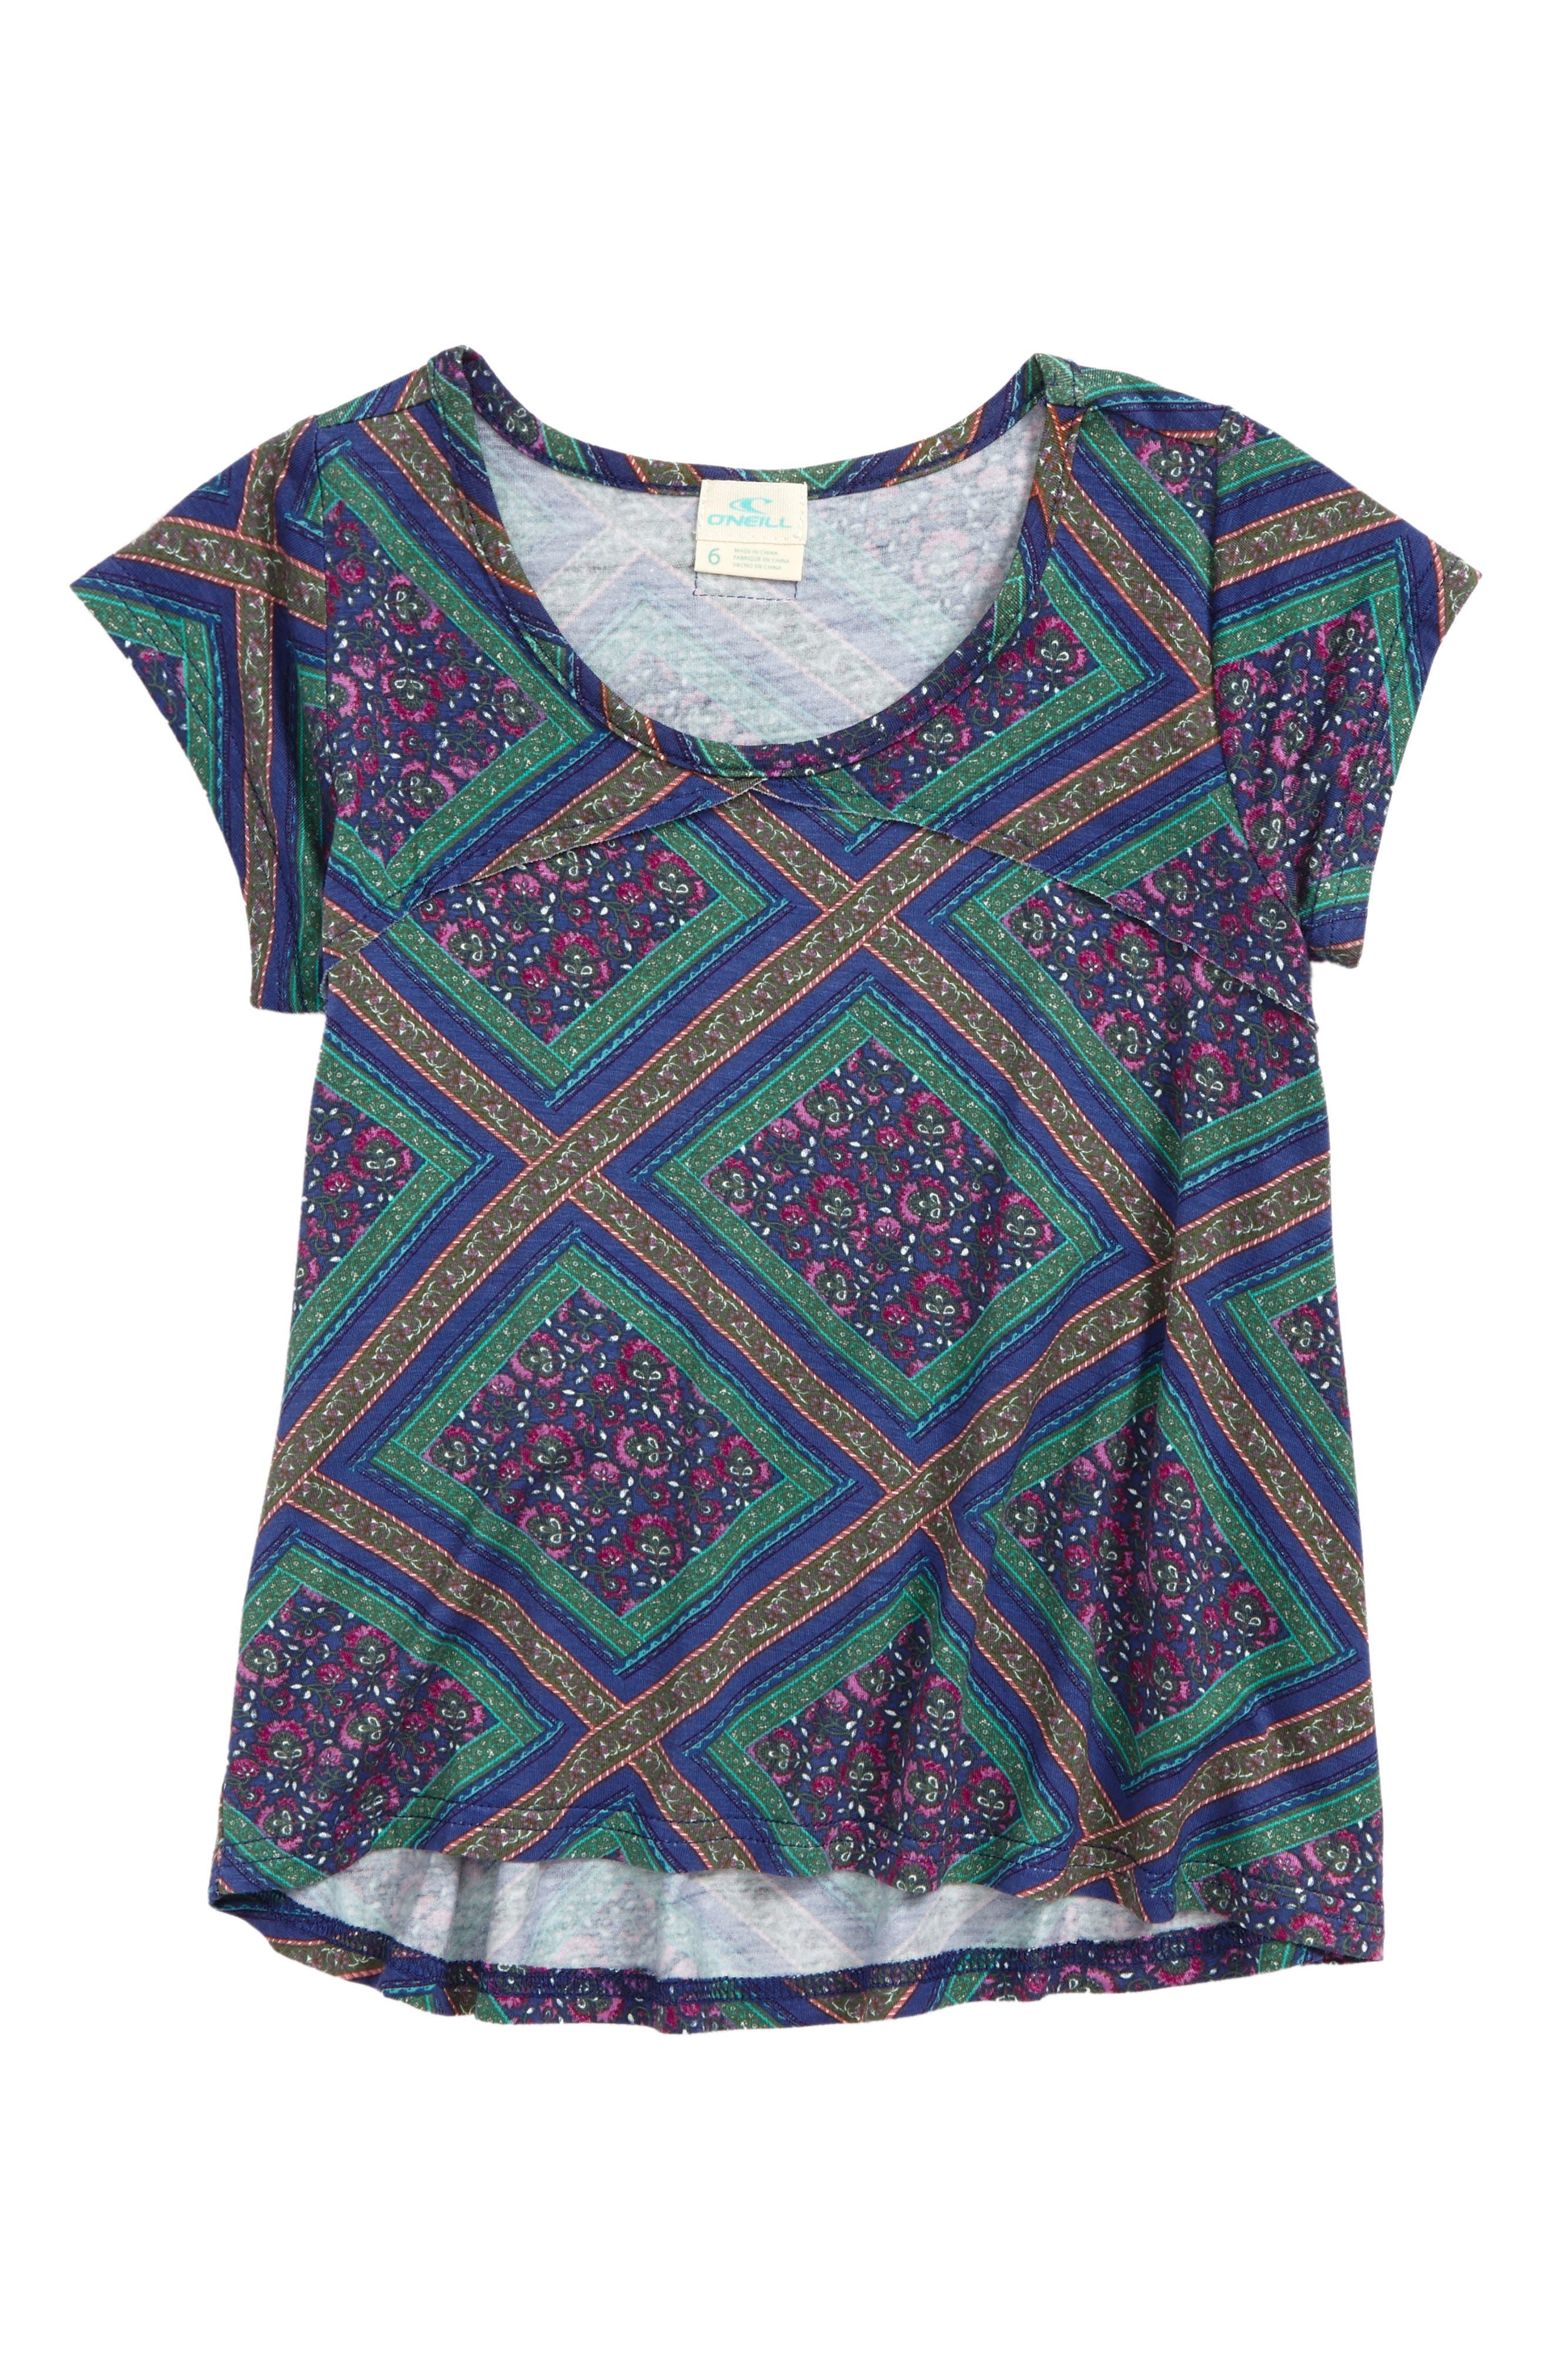 Emery Knit Top,                             Main thumbnail 1, color,